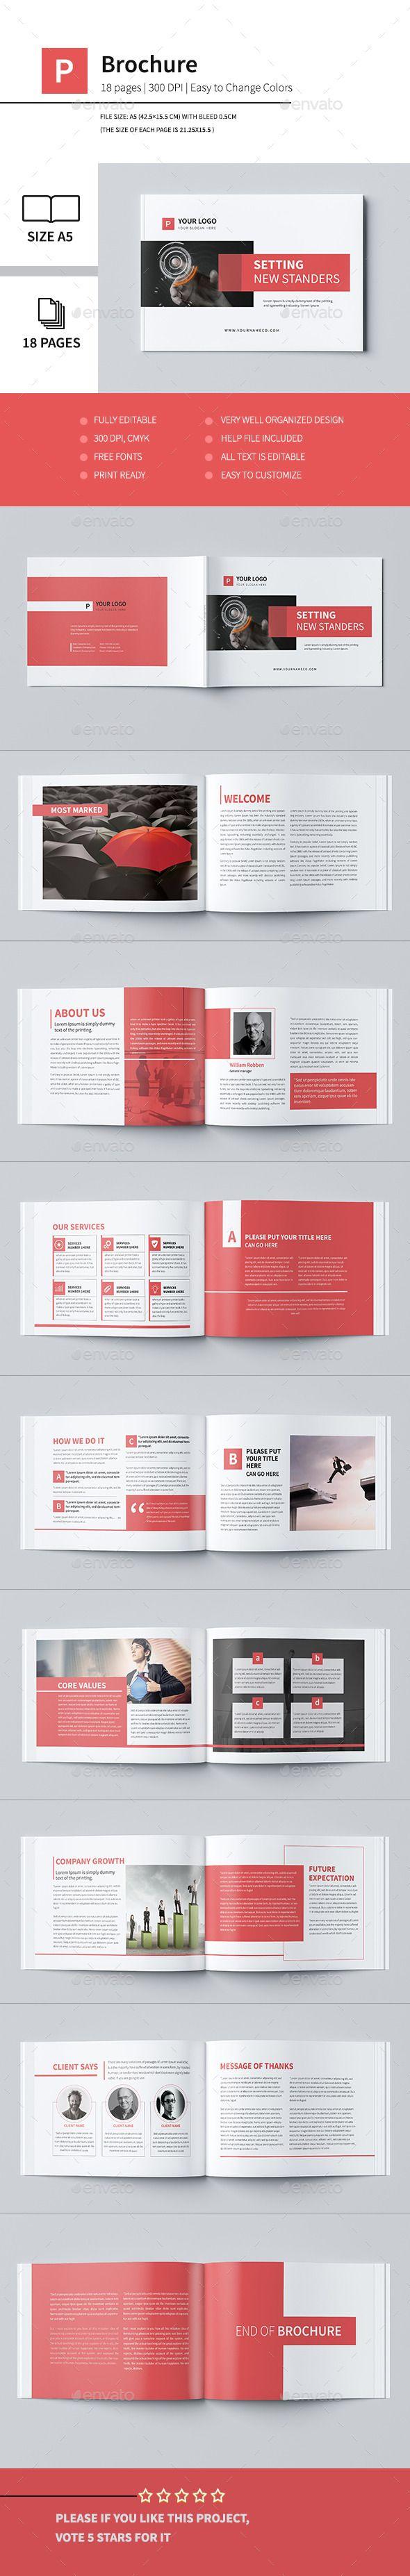 Minimal Business Brochure Template #brochure #design Download: http://graphicriver.net/item/minimal-business-brochure-iv/12598474?ref=ksioks